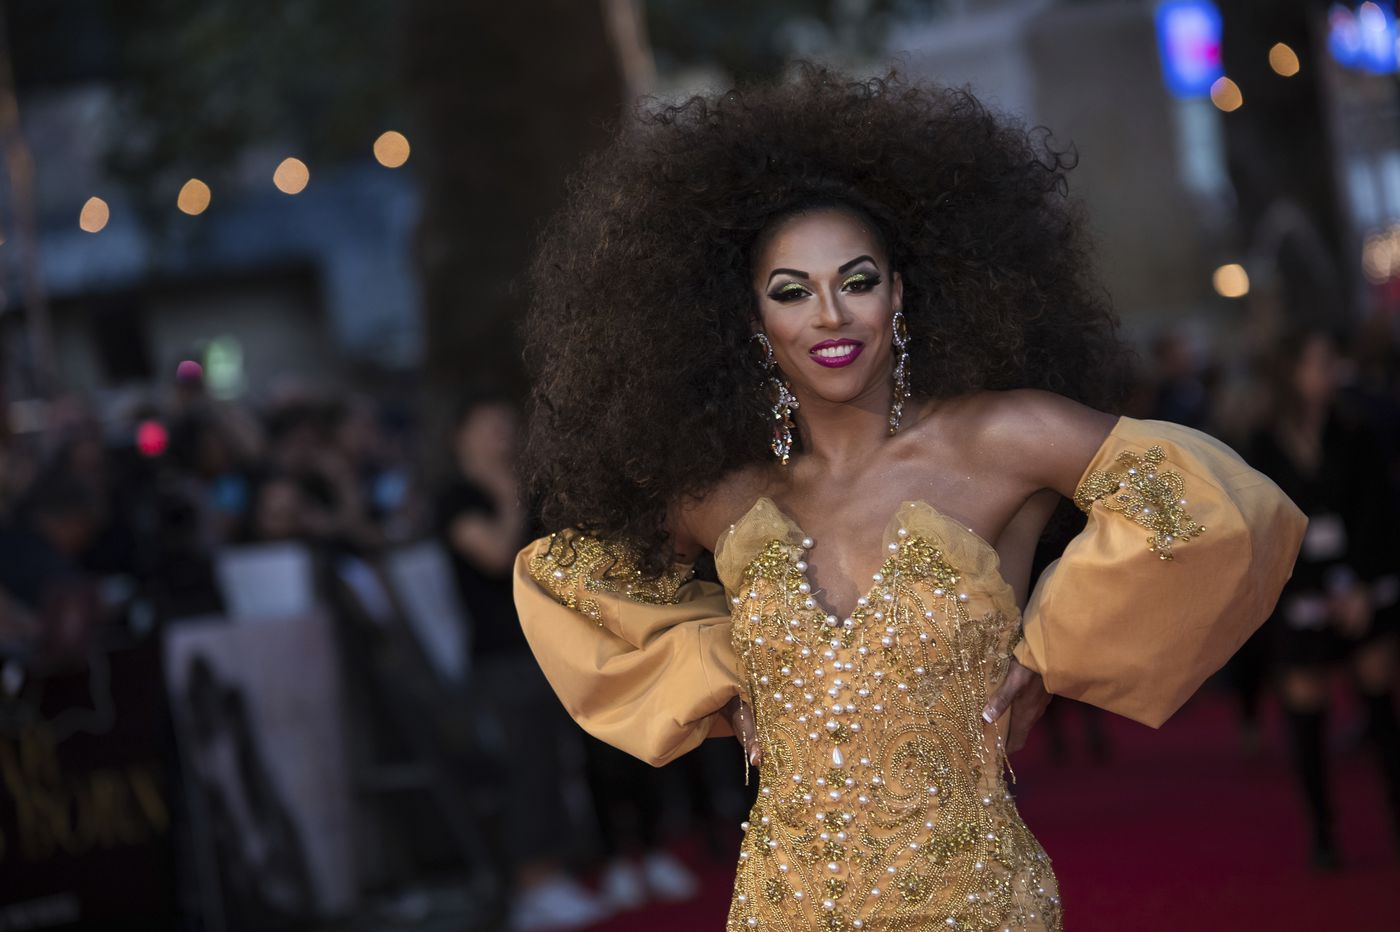 Drag superstar Shangela comes to Atlantic City